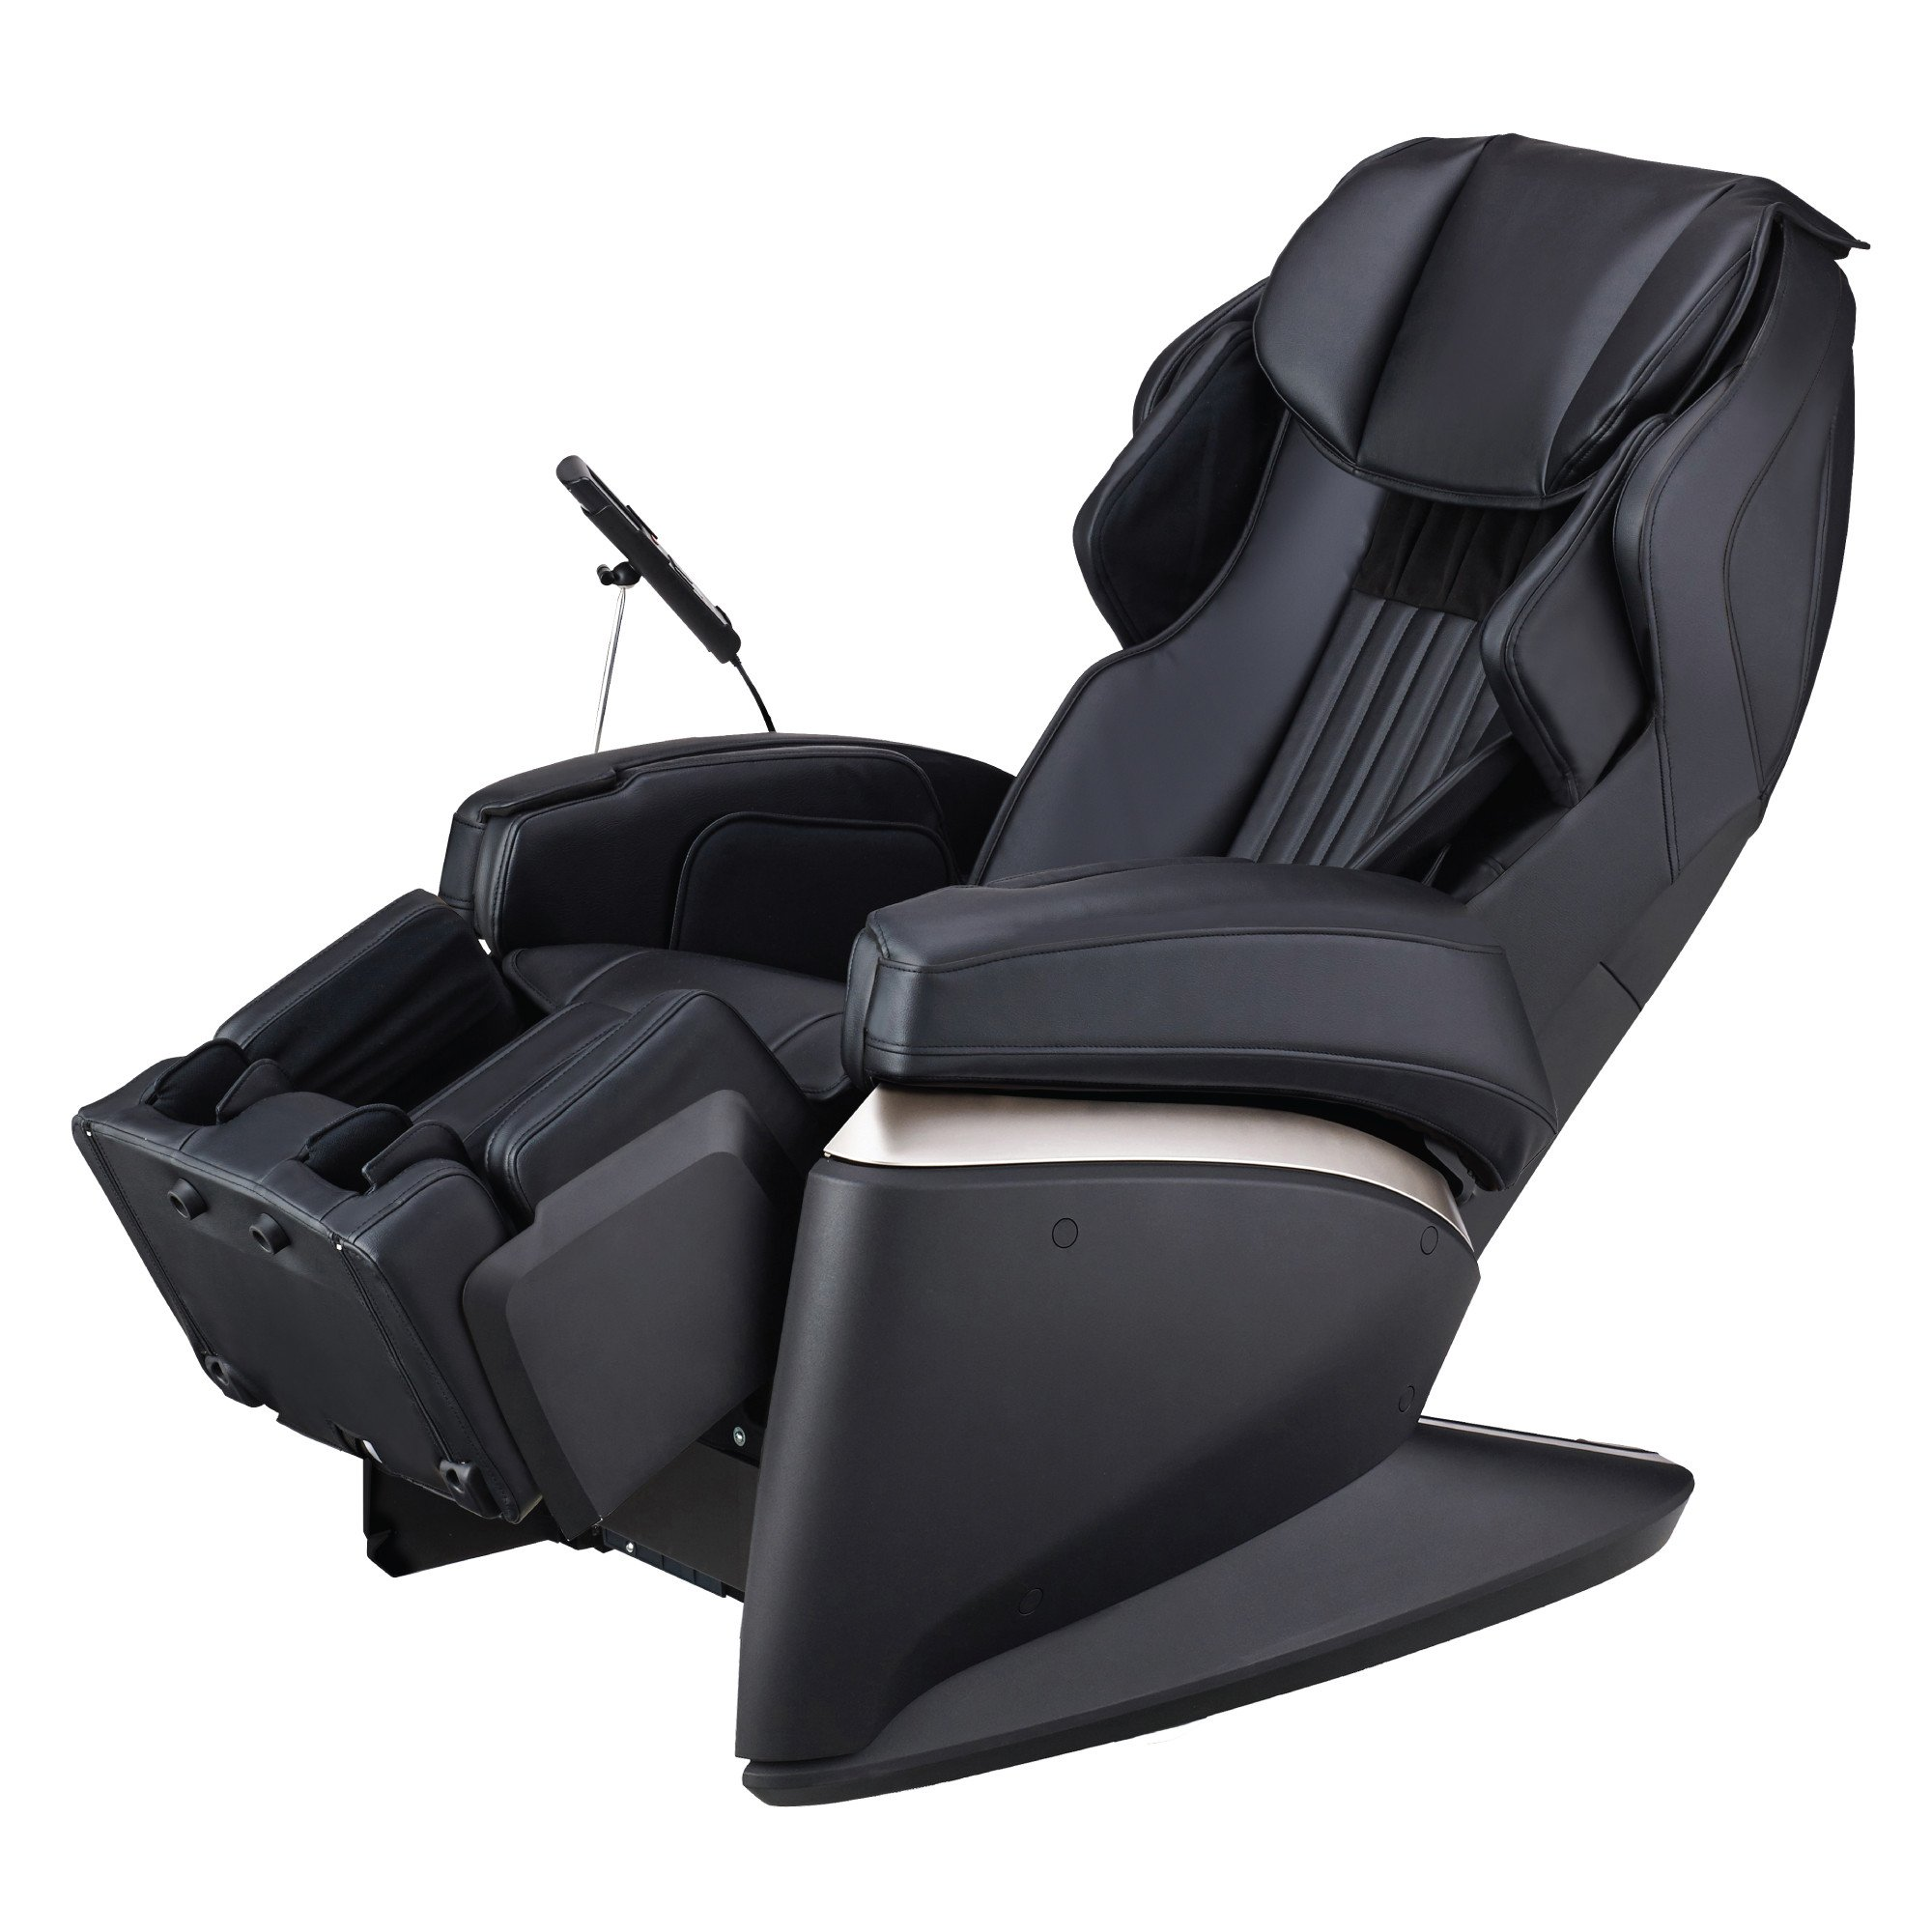 Osaki Japan 4S Premium Massage Chair - Black  - Front Angle View